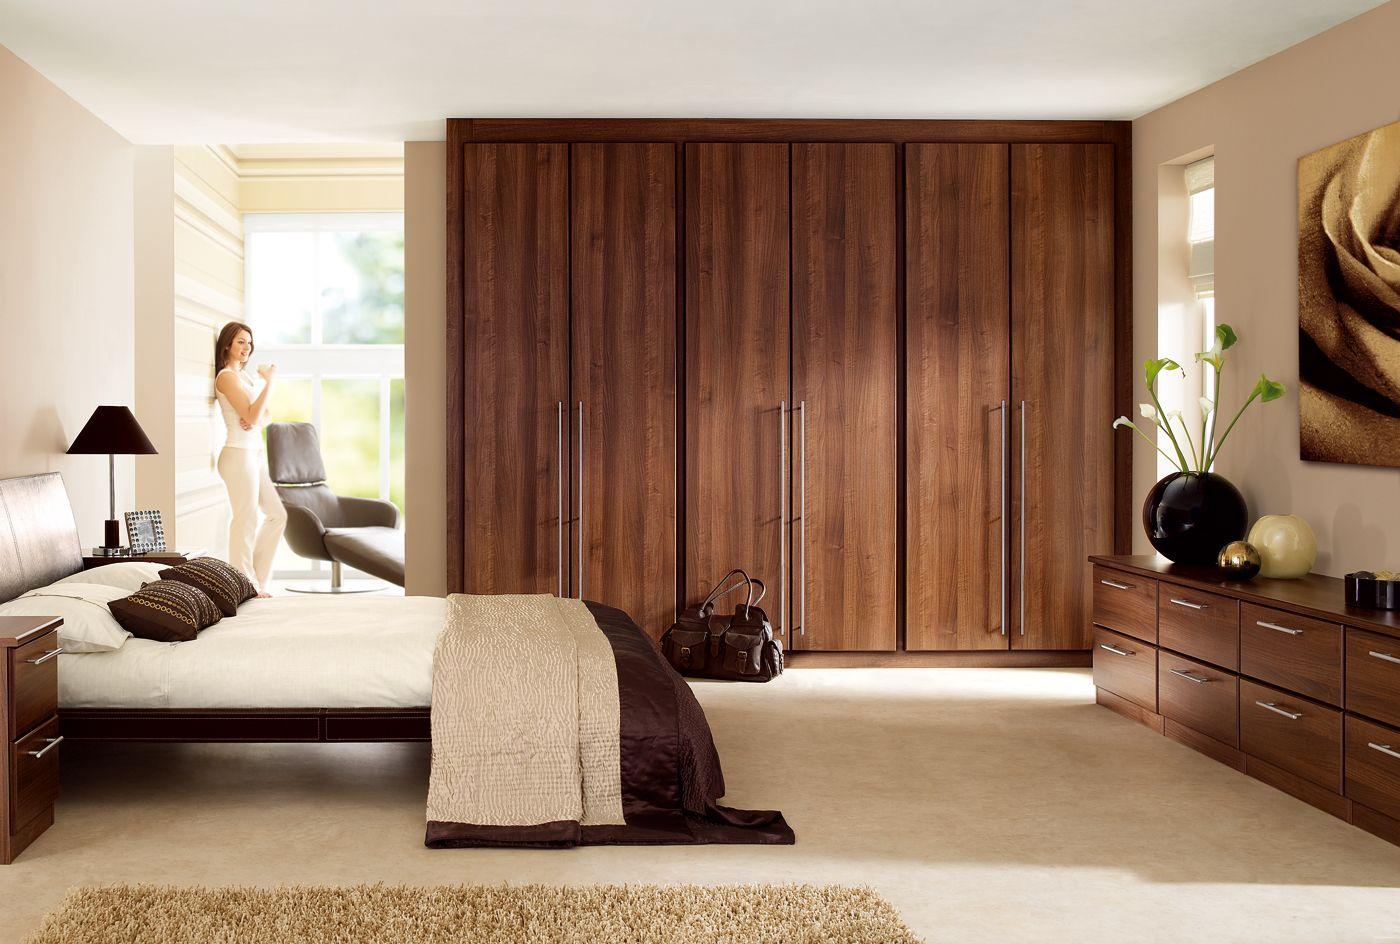 Bedroom Almirah Interior Designs Inspiration Malmowalnut 1400×944  Bedroom  Pinterest  Bedrooms Inspiration Design